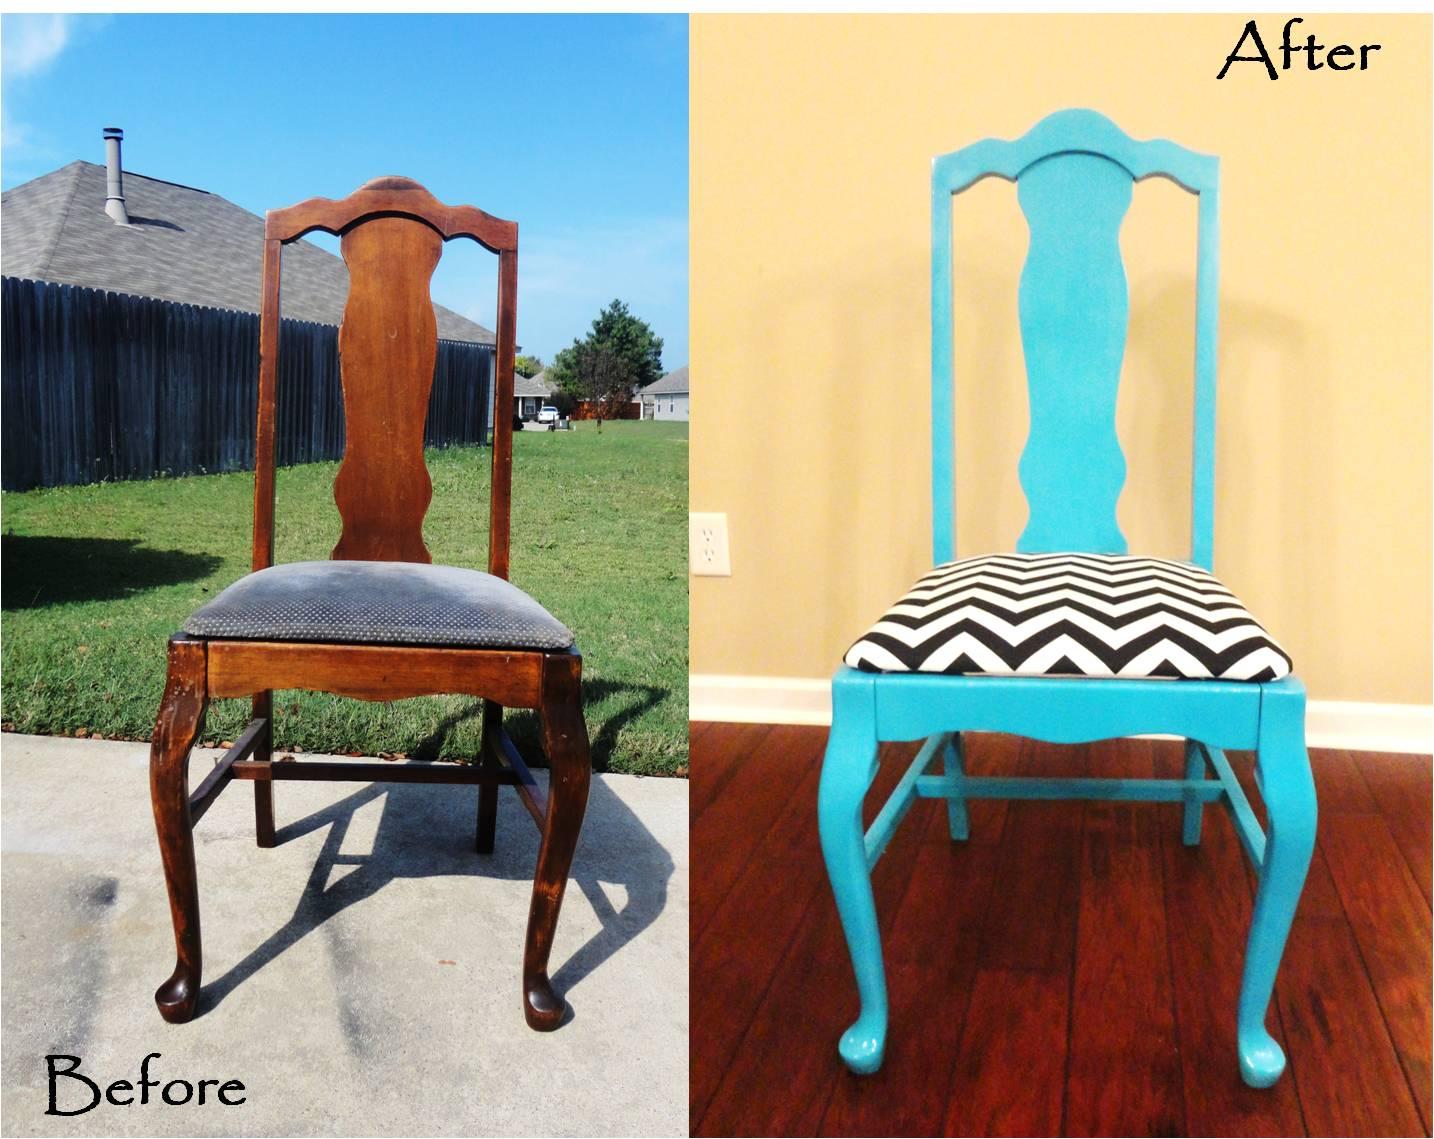 Make your home beautiful choose unique design furniture for Make home beautiful